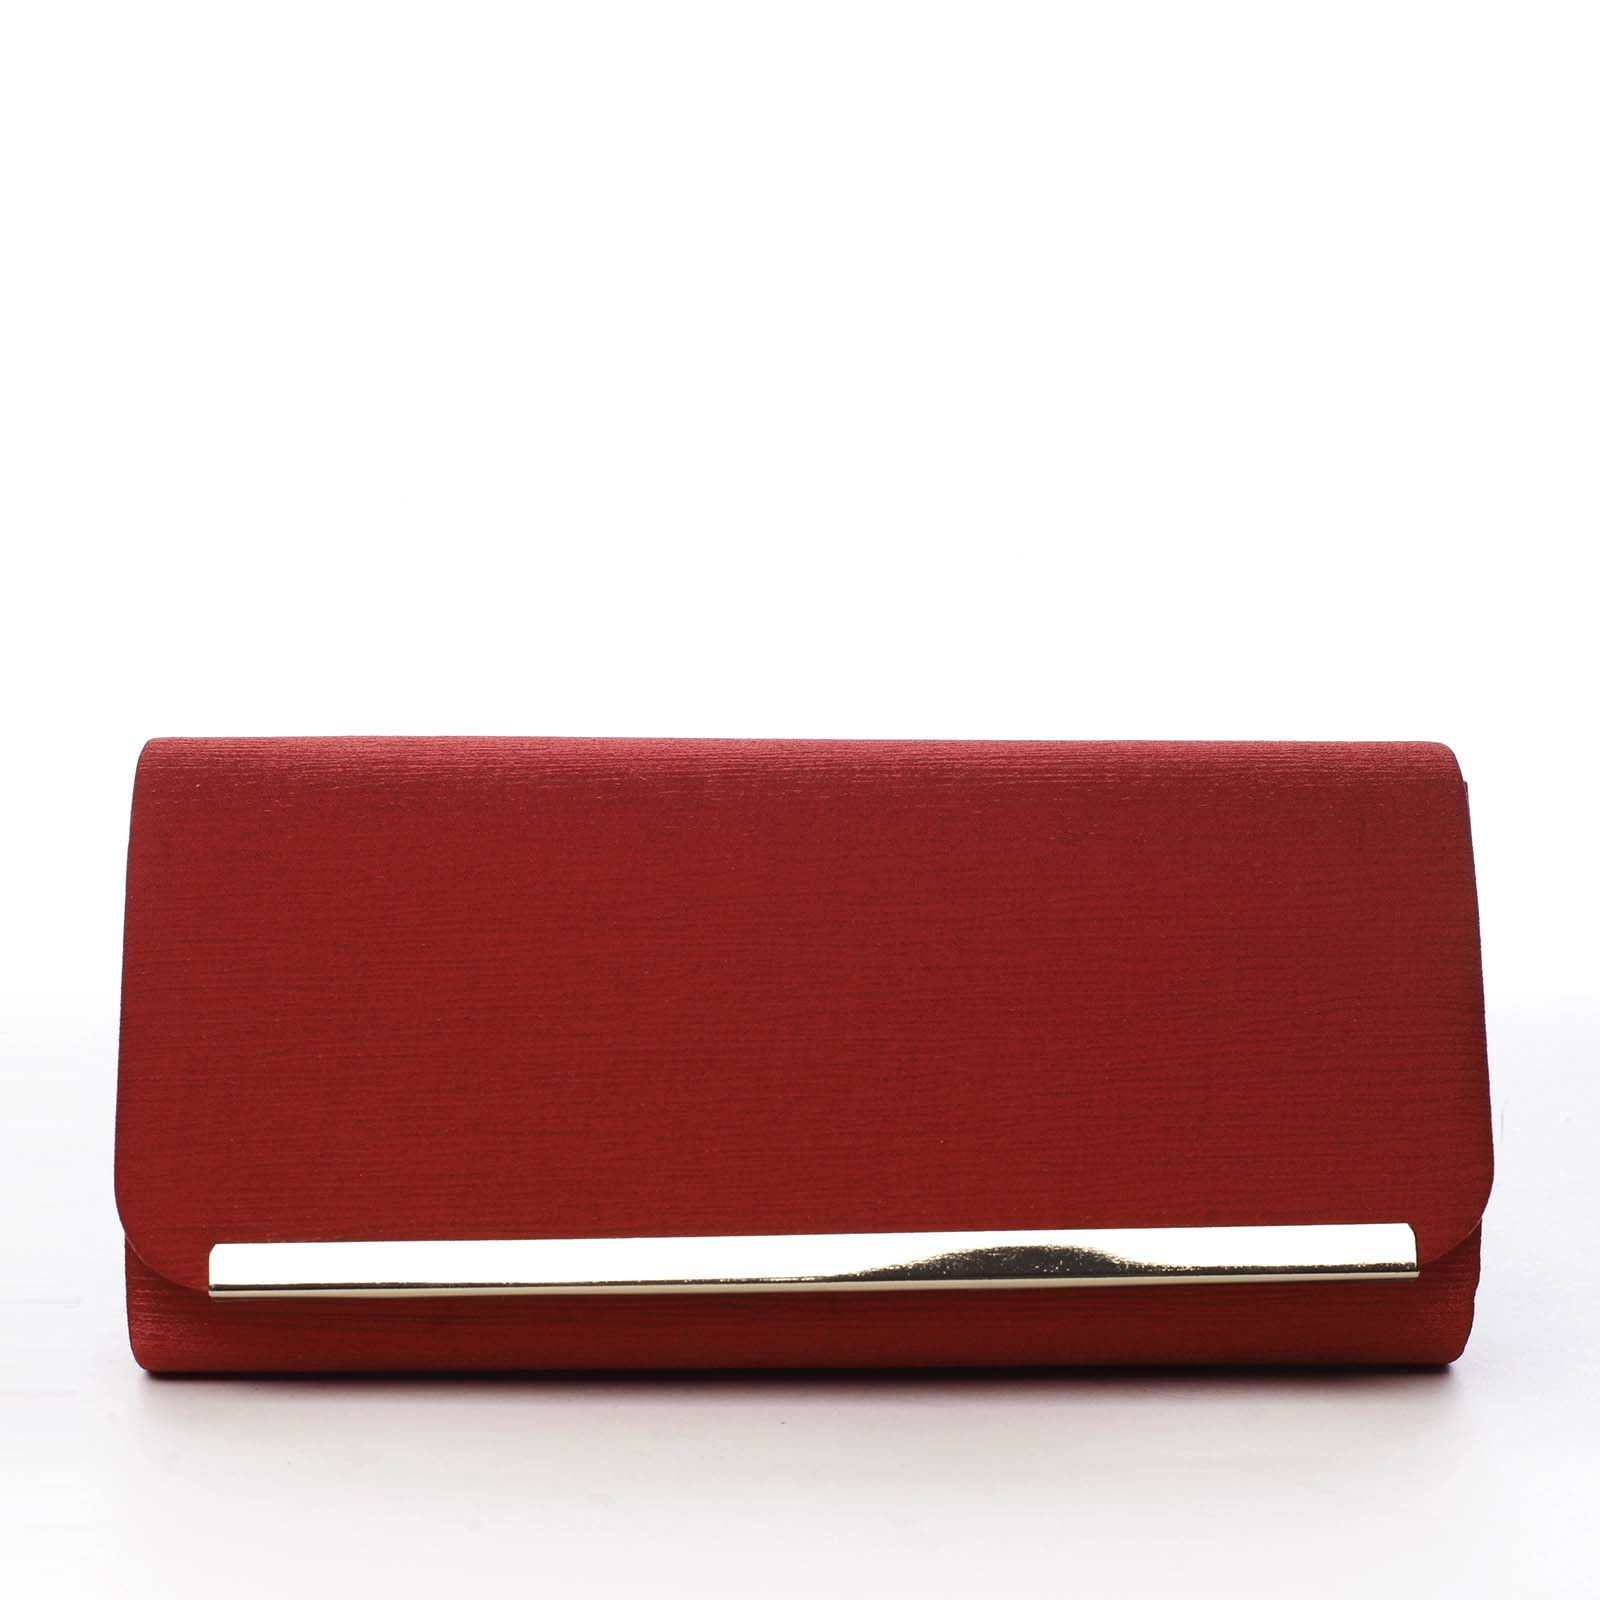 Dámska listová kabelka červená - Michelle Moon D888